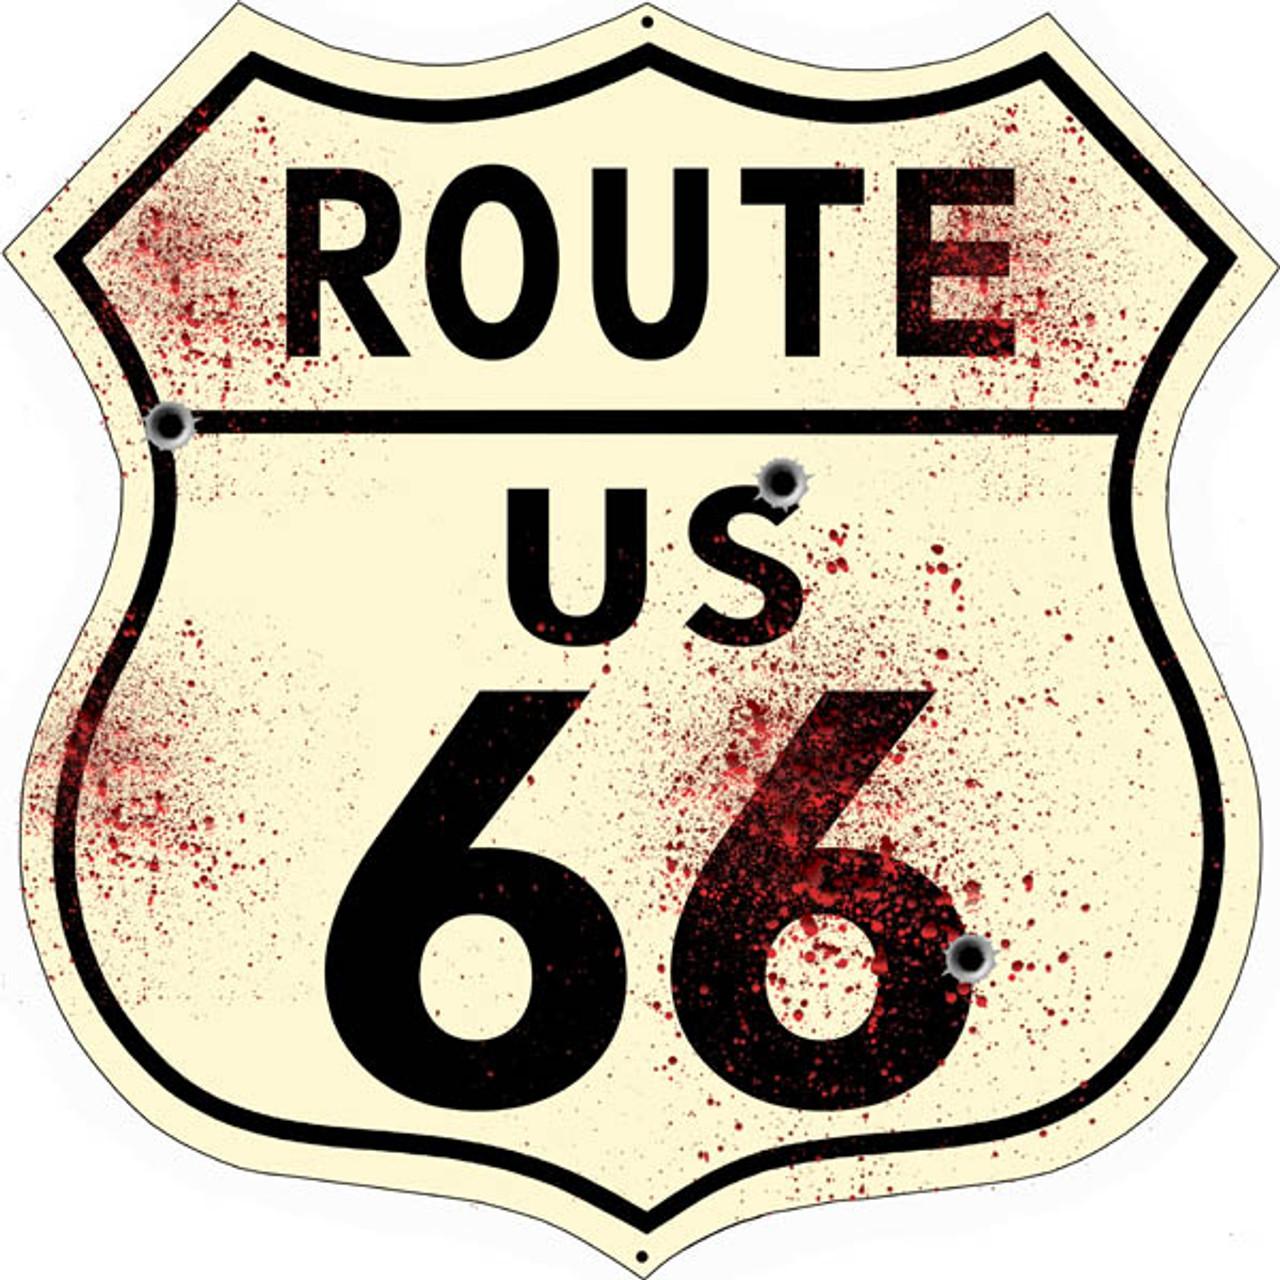 WILLIAMS ARIZONA Route 66 Shield Metal Sign Man Cave Garage 211110013018